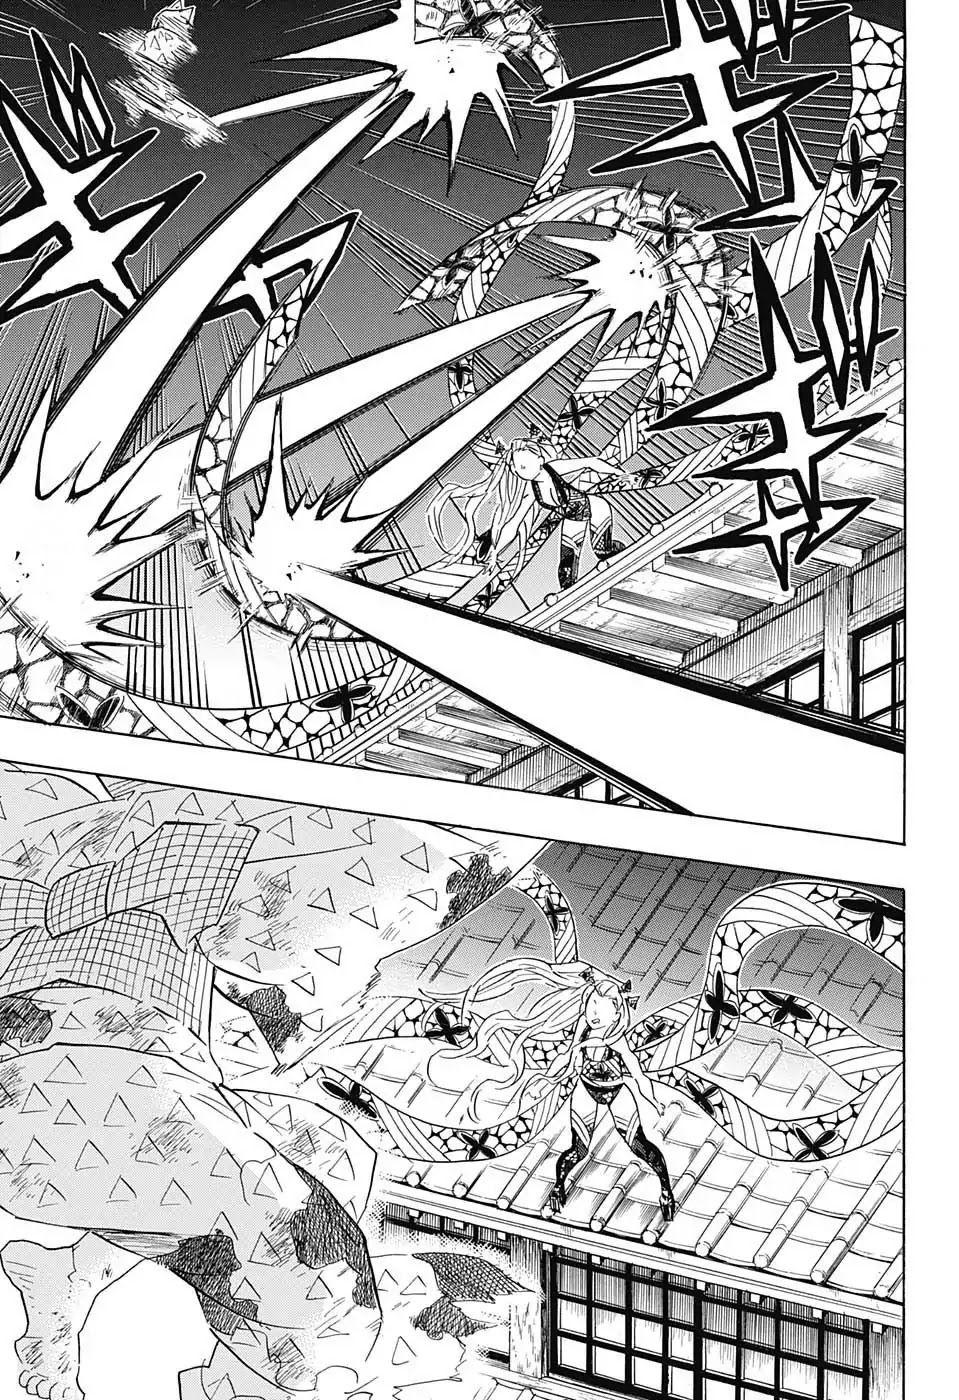 Demon Slayer Vol 11 Chapter 93 Never Give Up Demon Slayer Manga Online In 2020 Slayer Manga Demon